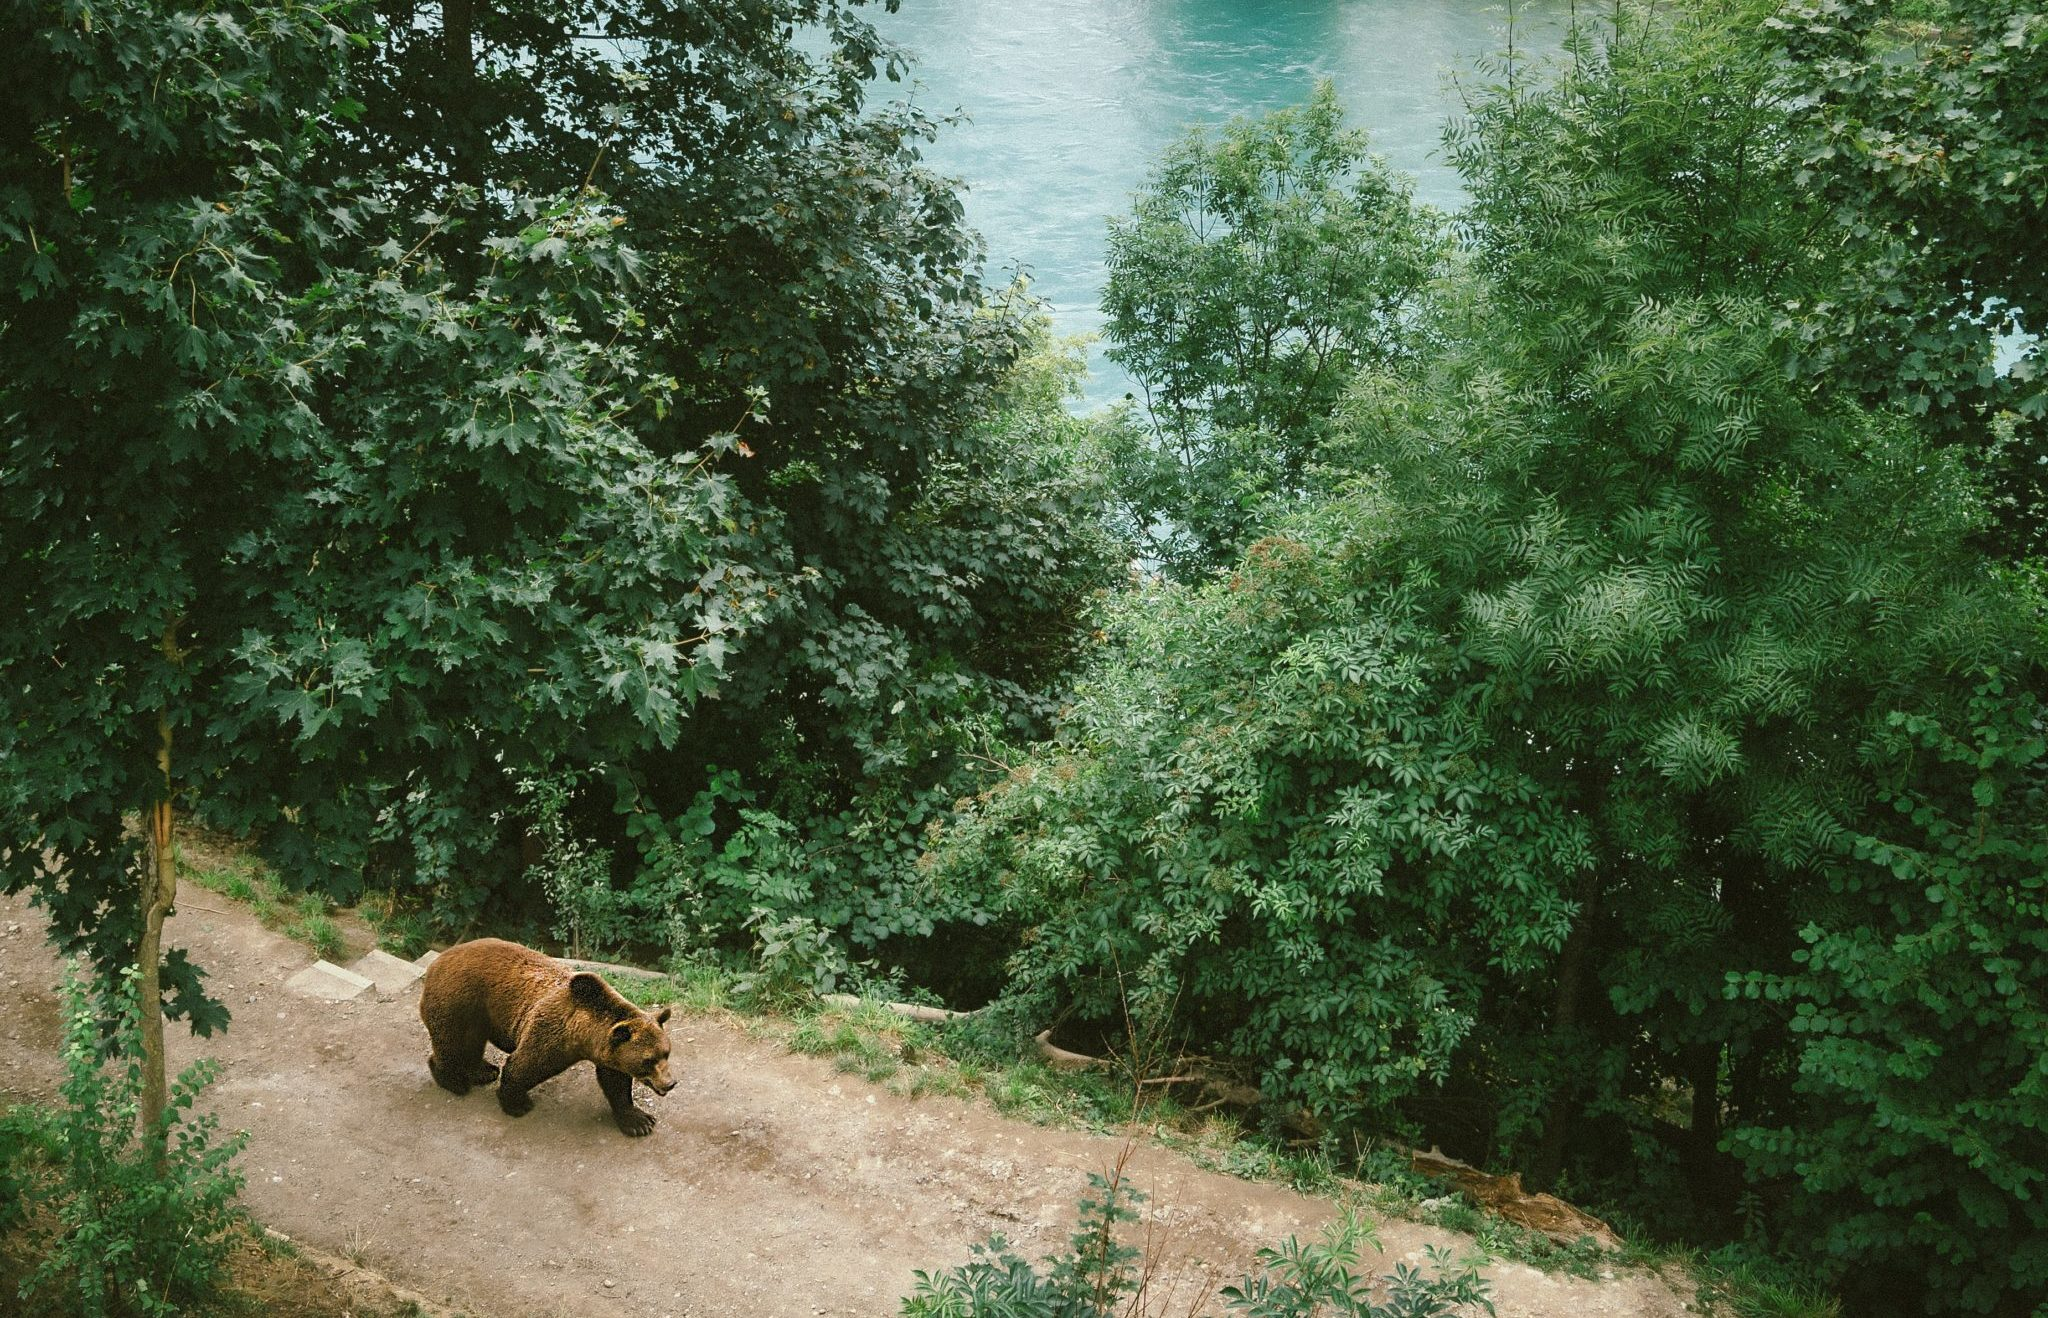 droom betekenis dieren - betekenis van jouw droom - betekenissen dromen - betekenis droom beer - droom betekenis beer